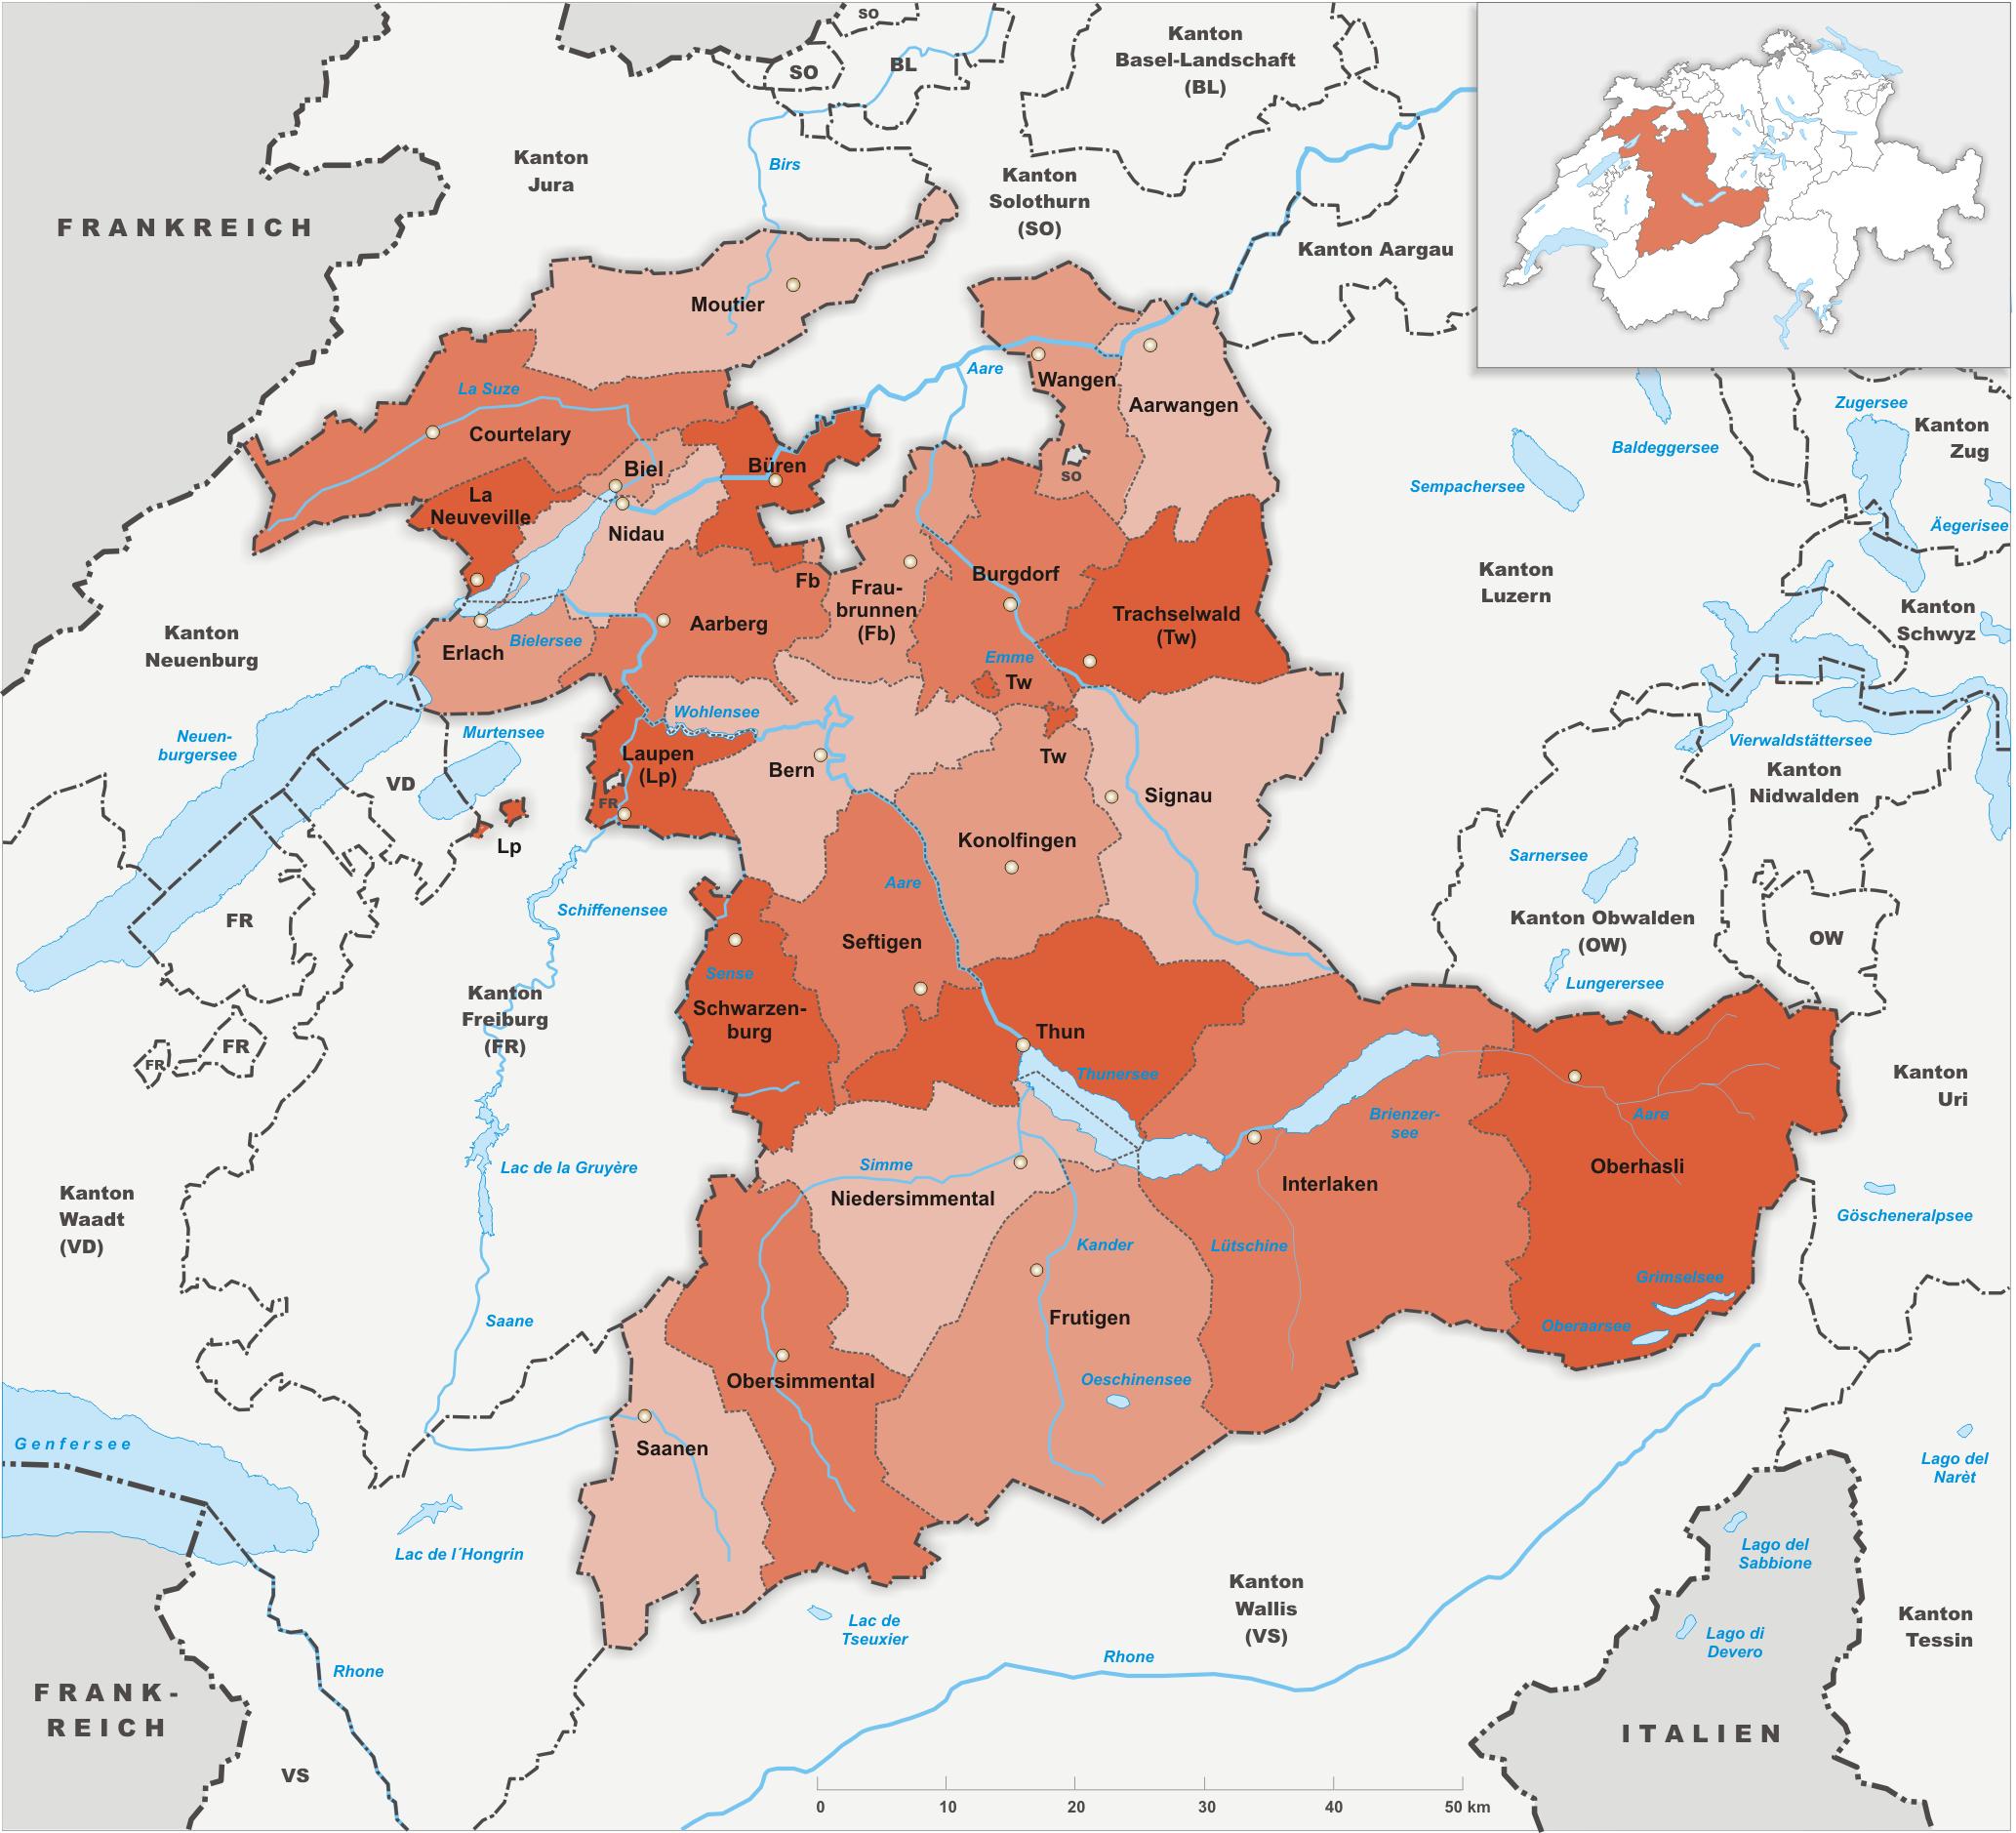 Amtsbezirke des Kantons Bern bis 2009